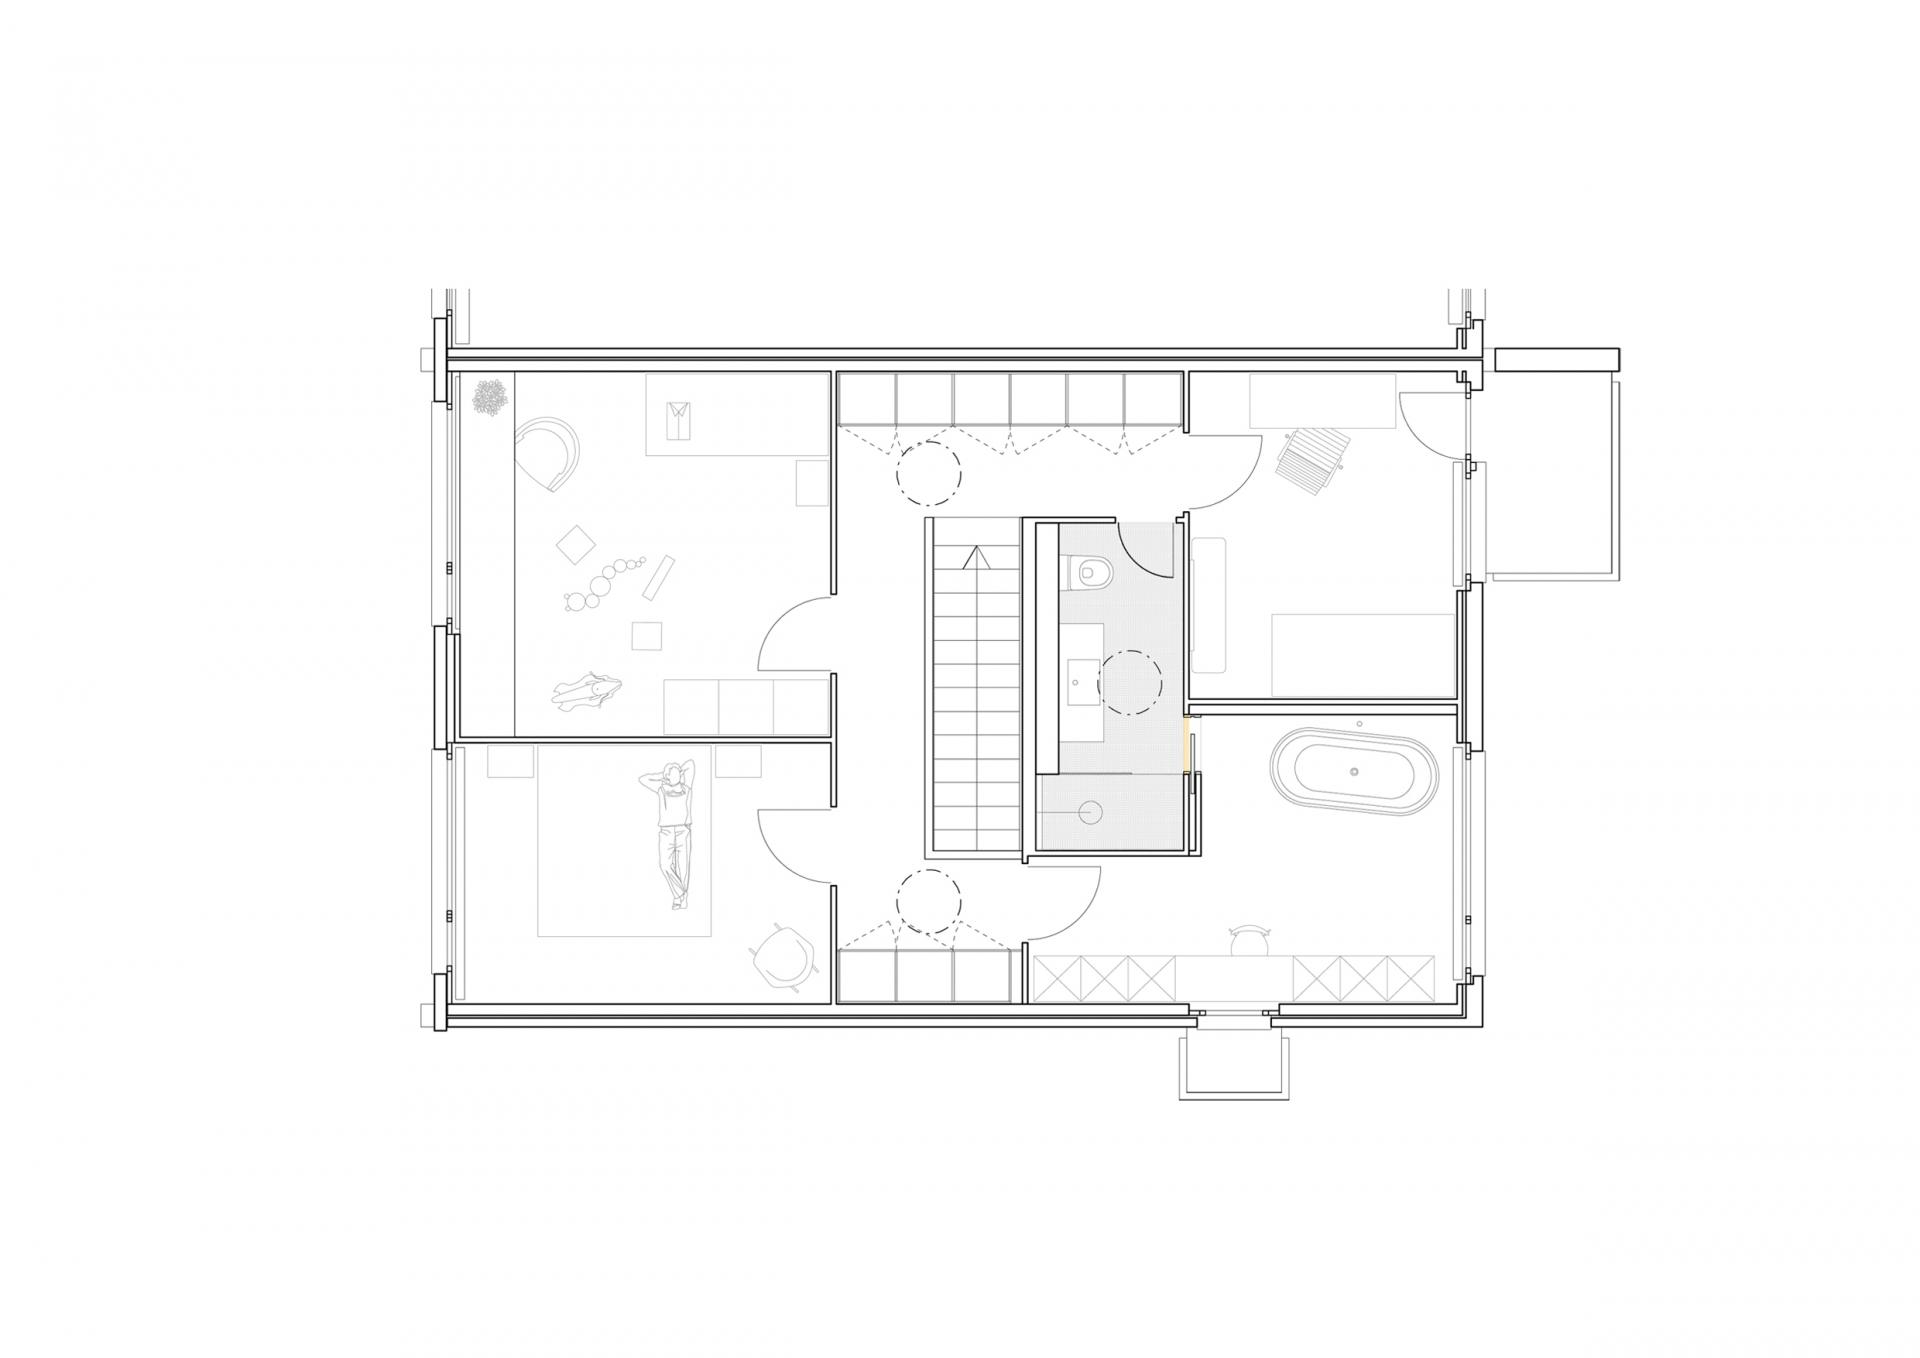 buan-architekten-umbau waldstrasse-luzern-obergeschoss